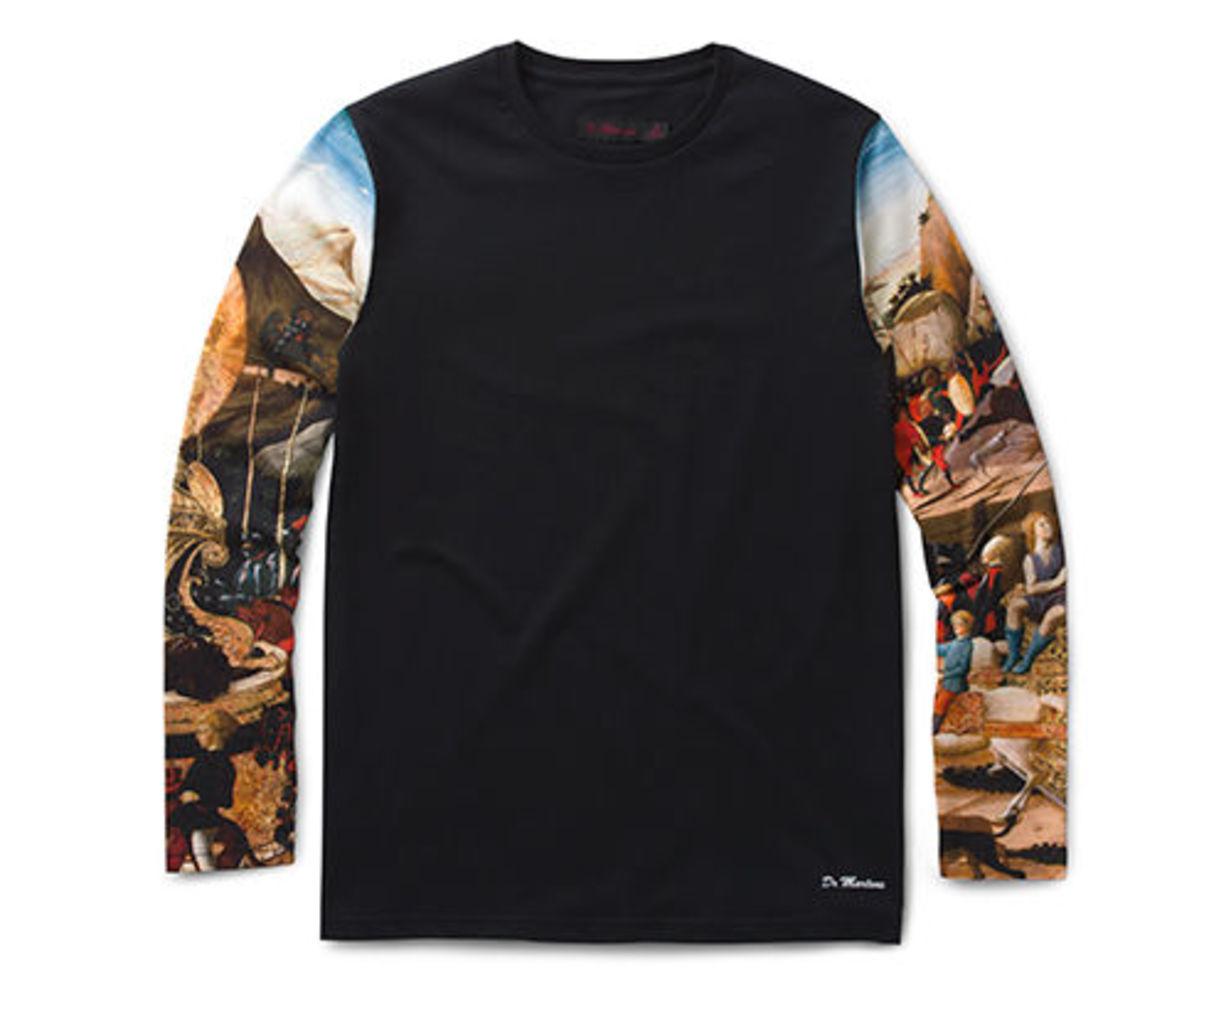 D'Antonio L/S T-Shirt